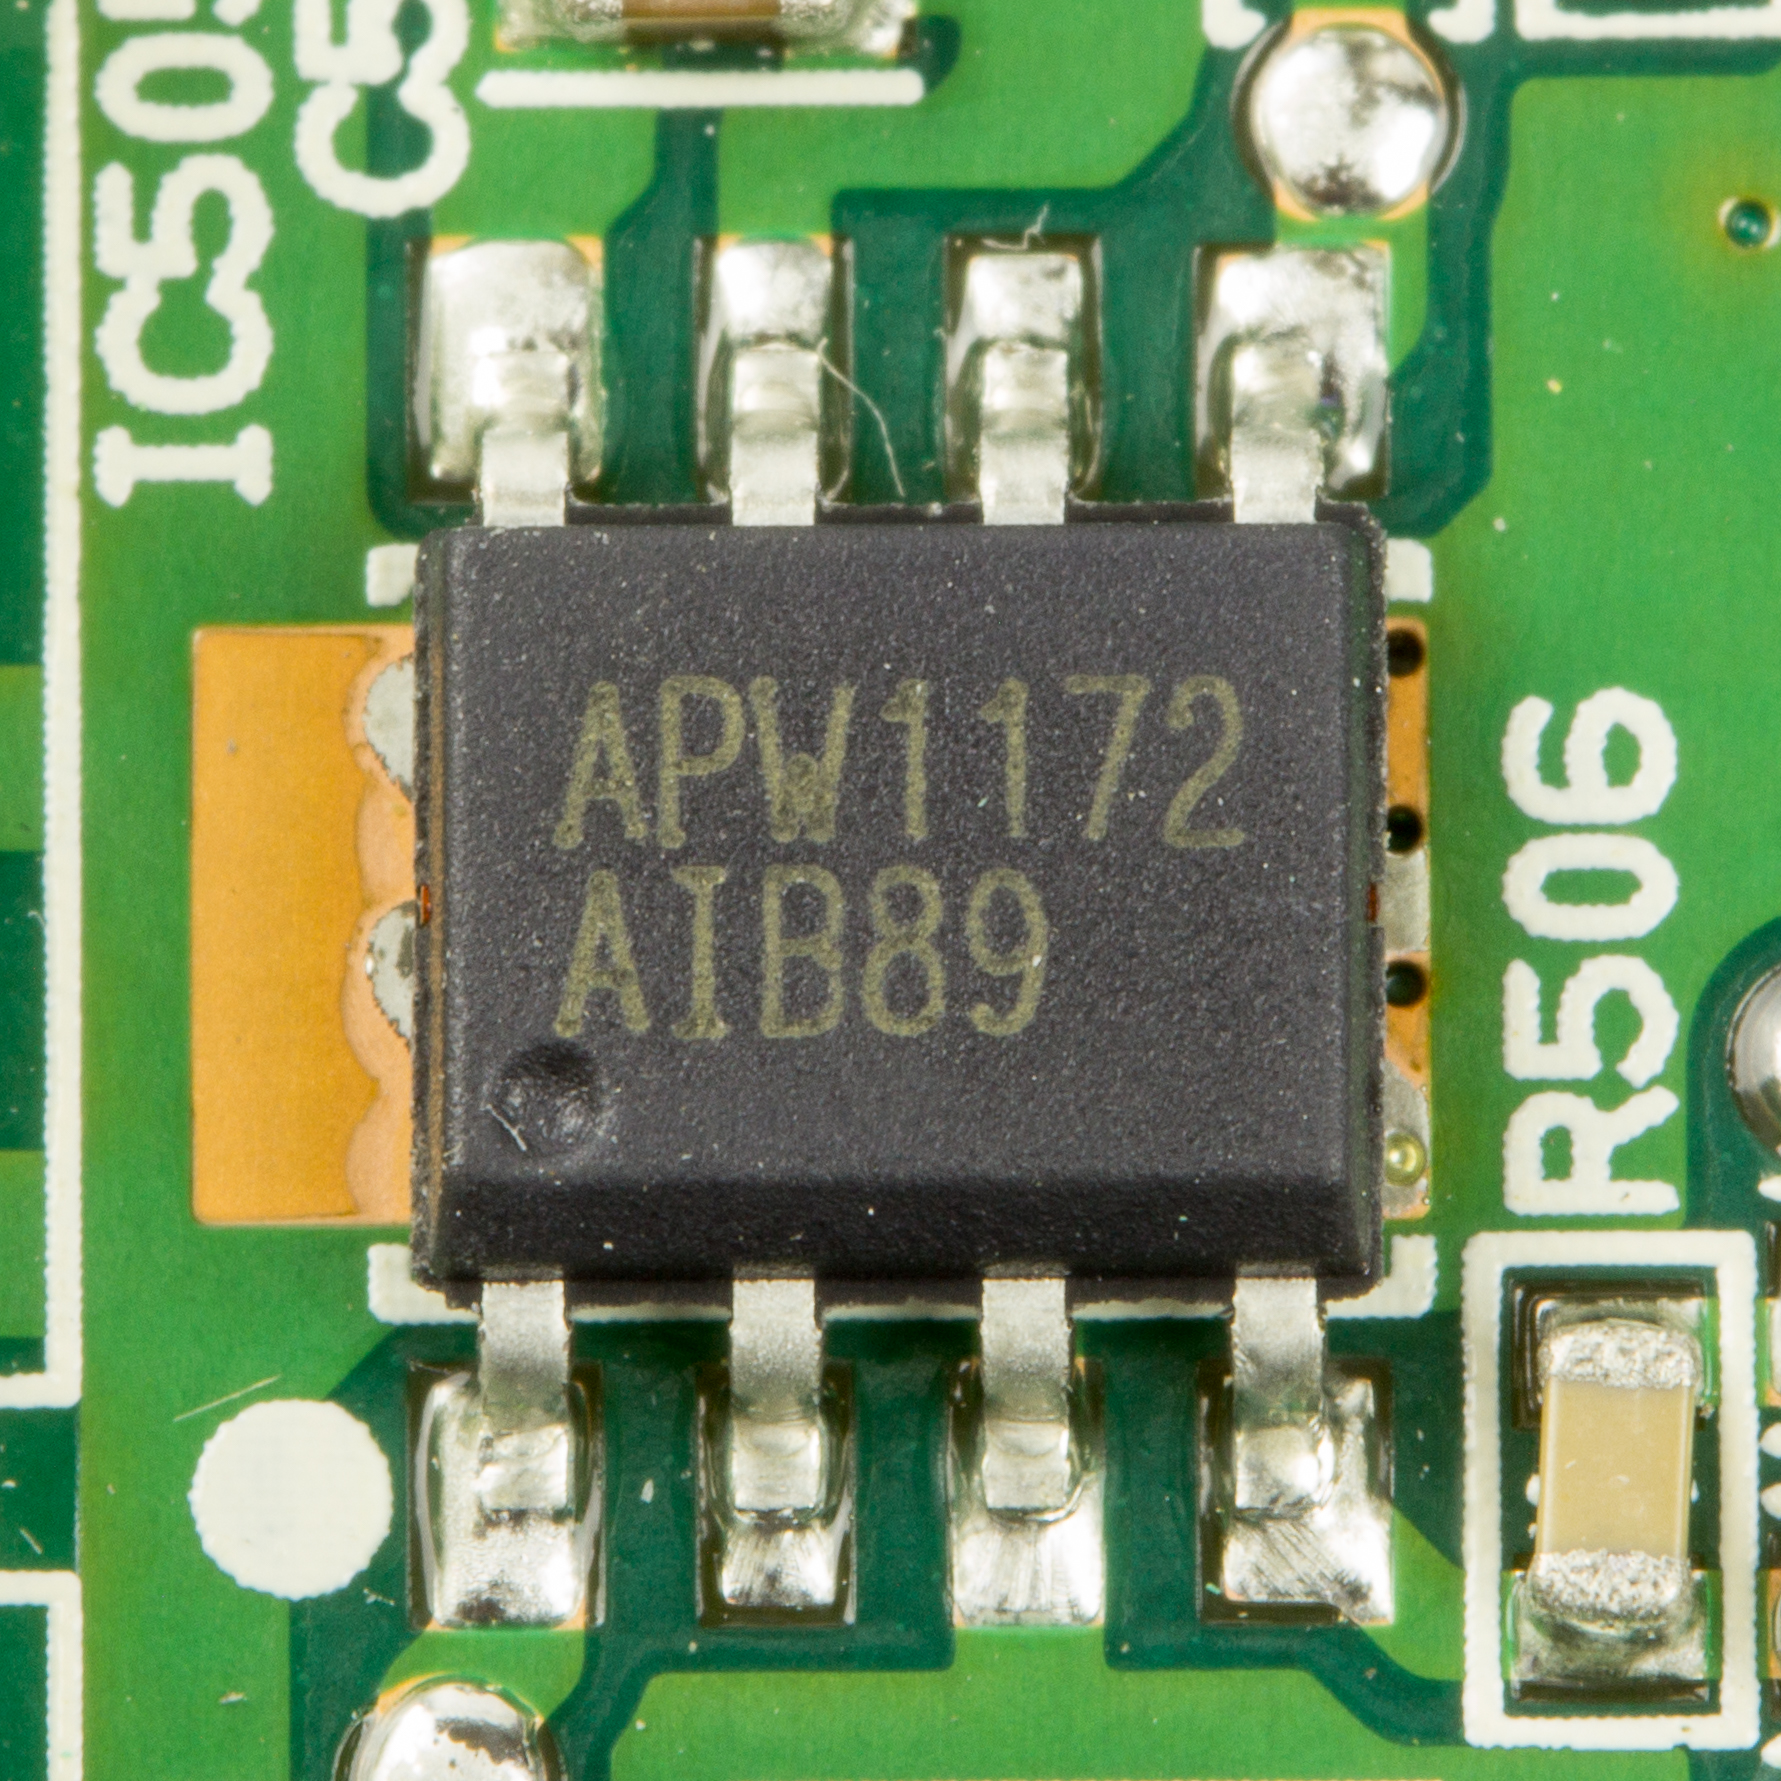 Filejrp6 Pata 2 Usb Adapter Anpec Apw1172 8677 Wikimedia Electronic Circuit Jr